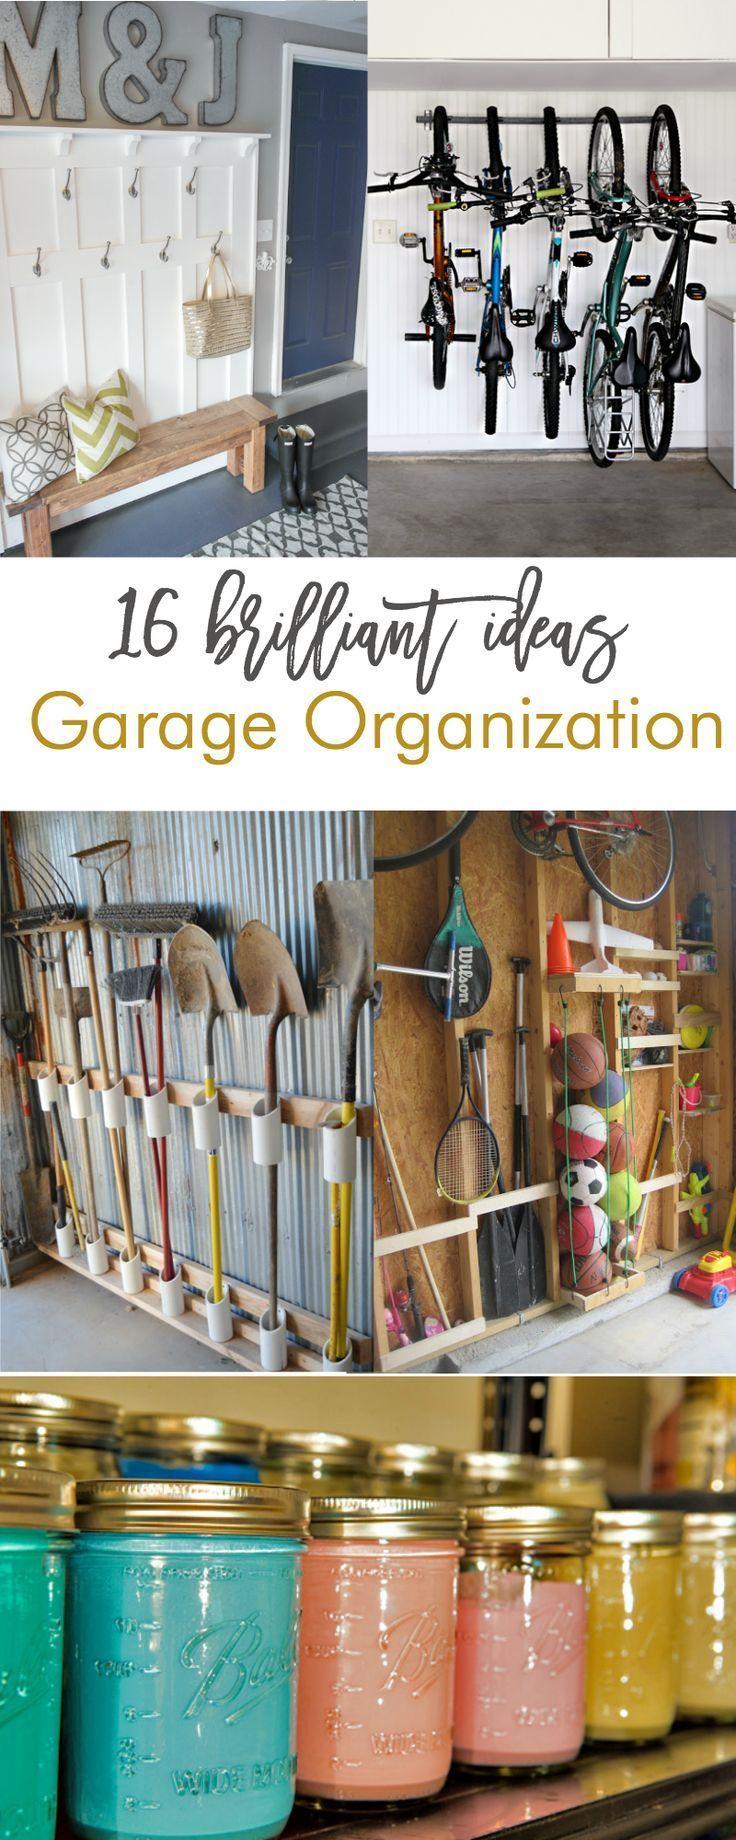 16 brilliant diy garage organization ideas garage